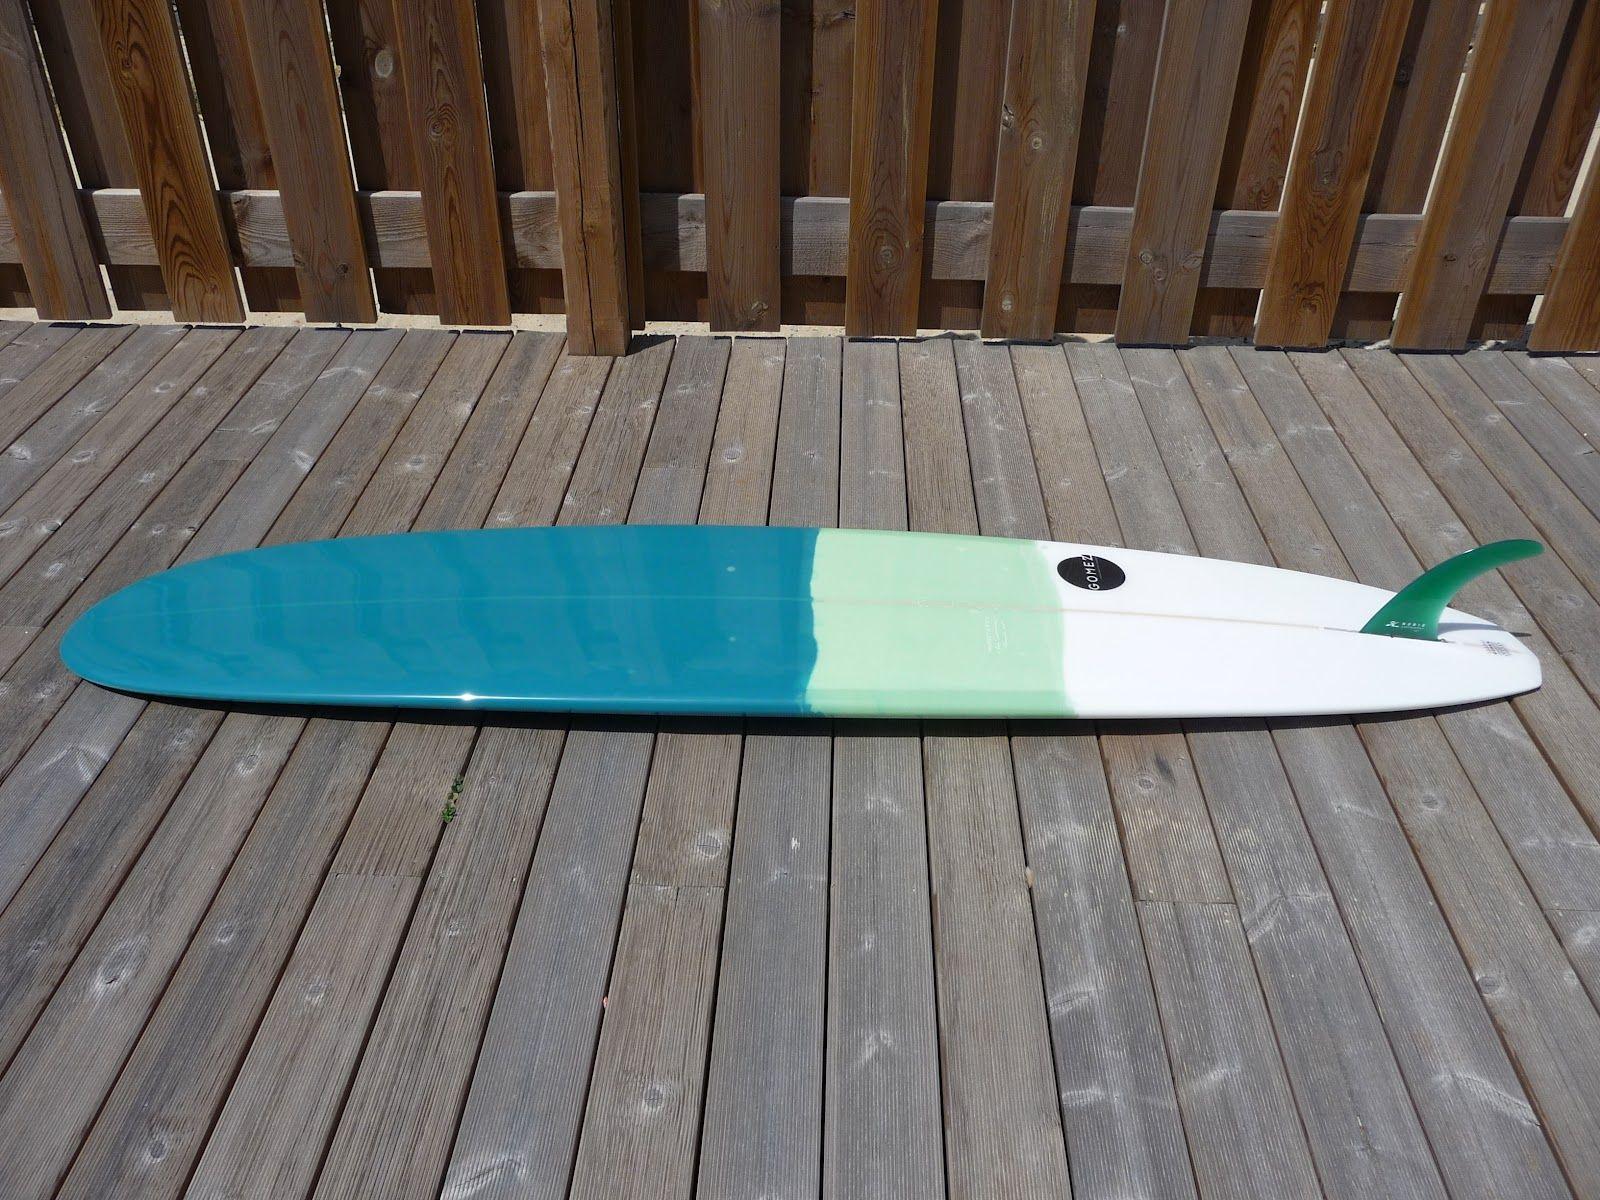 surfboard designs and colors images. Black Bedroom Furniture Sets. Home Design Ideas